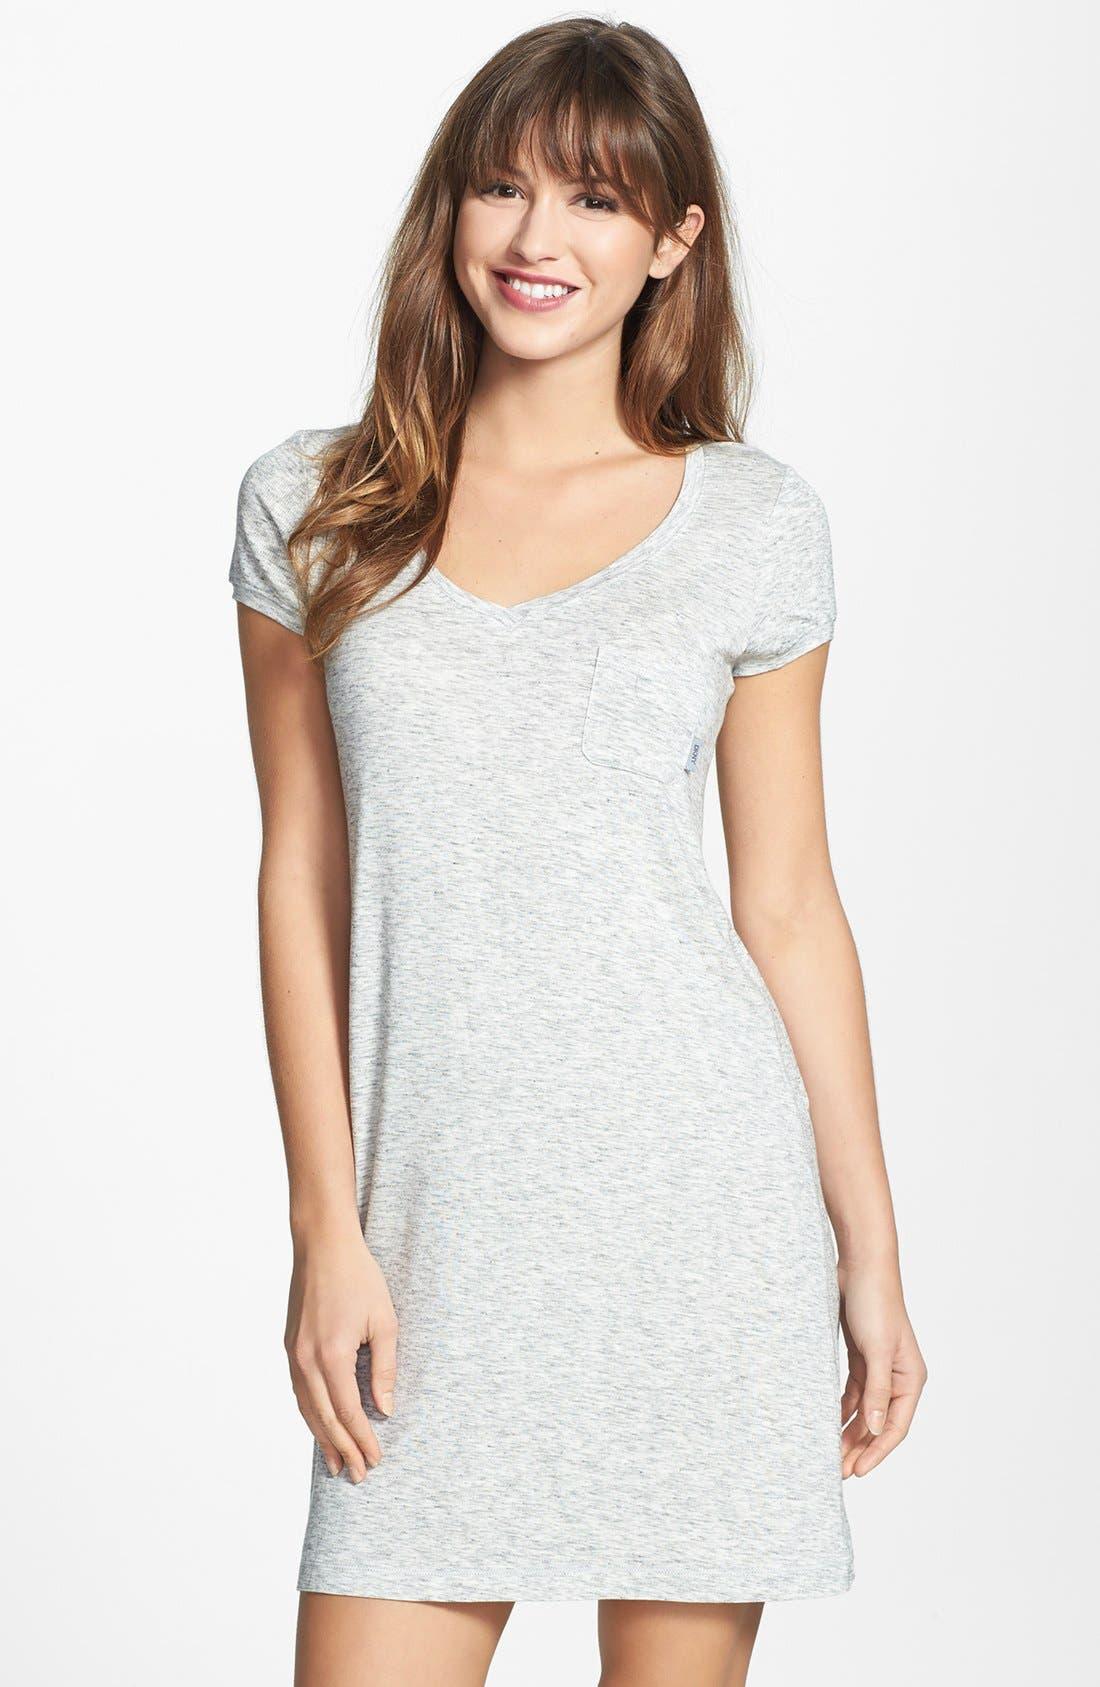 DKNY 'City Essentials' V-Neck Sleep Shirt